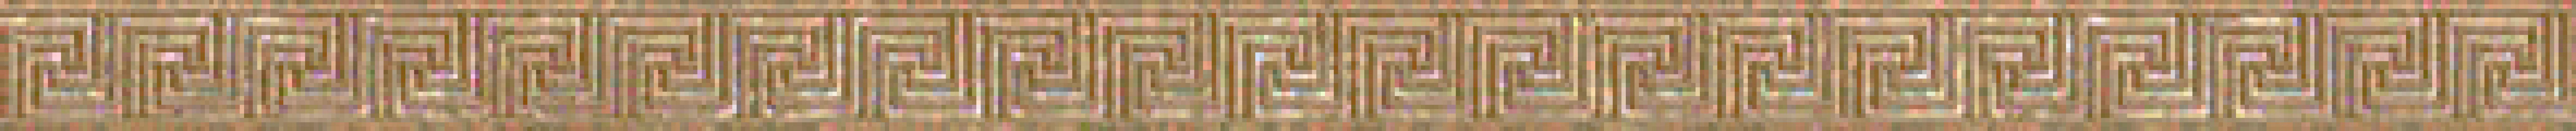 7 2x50